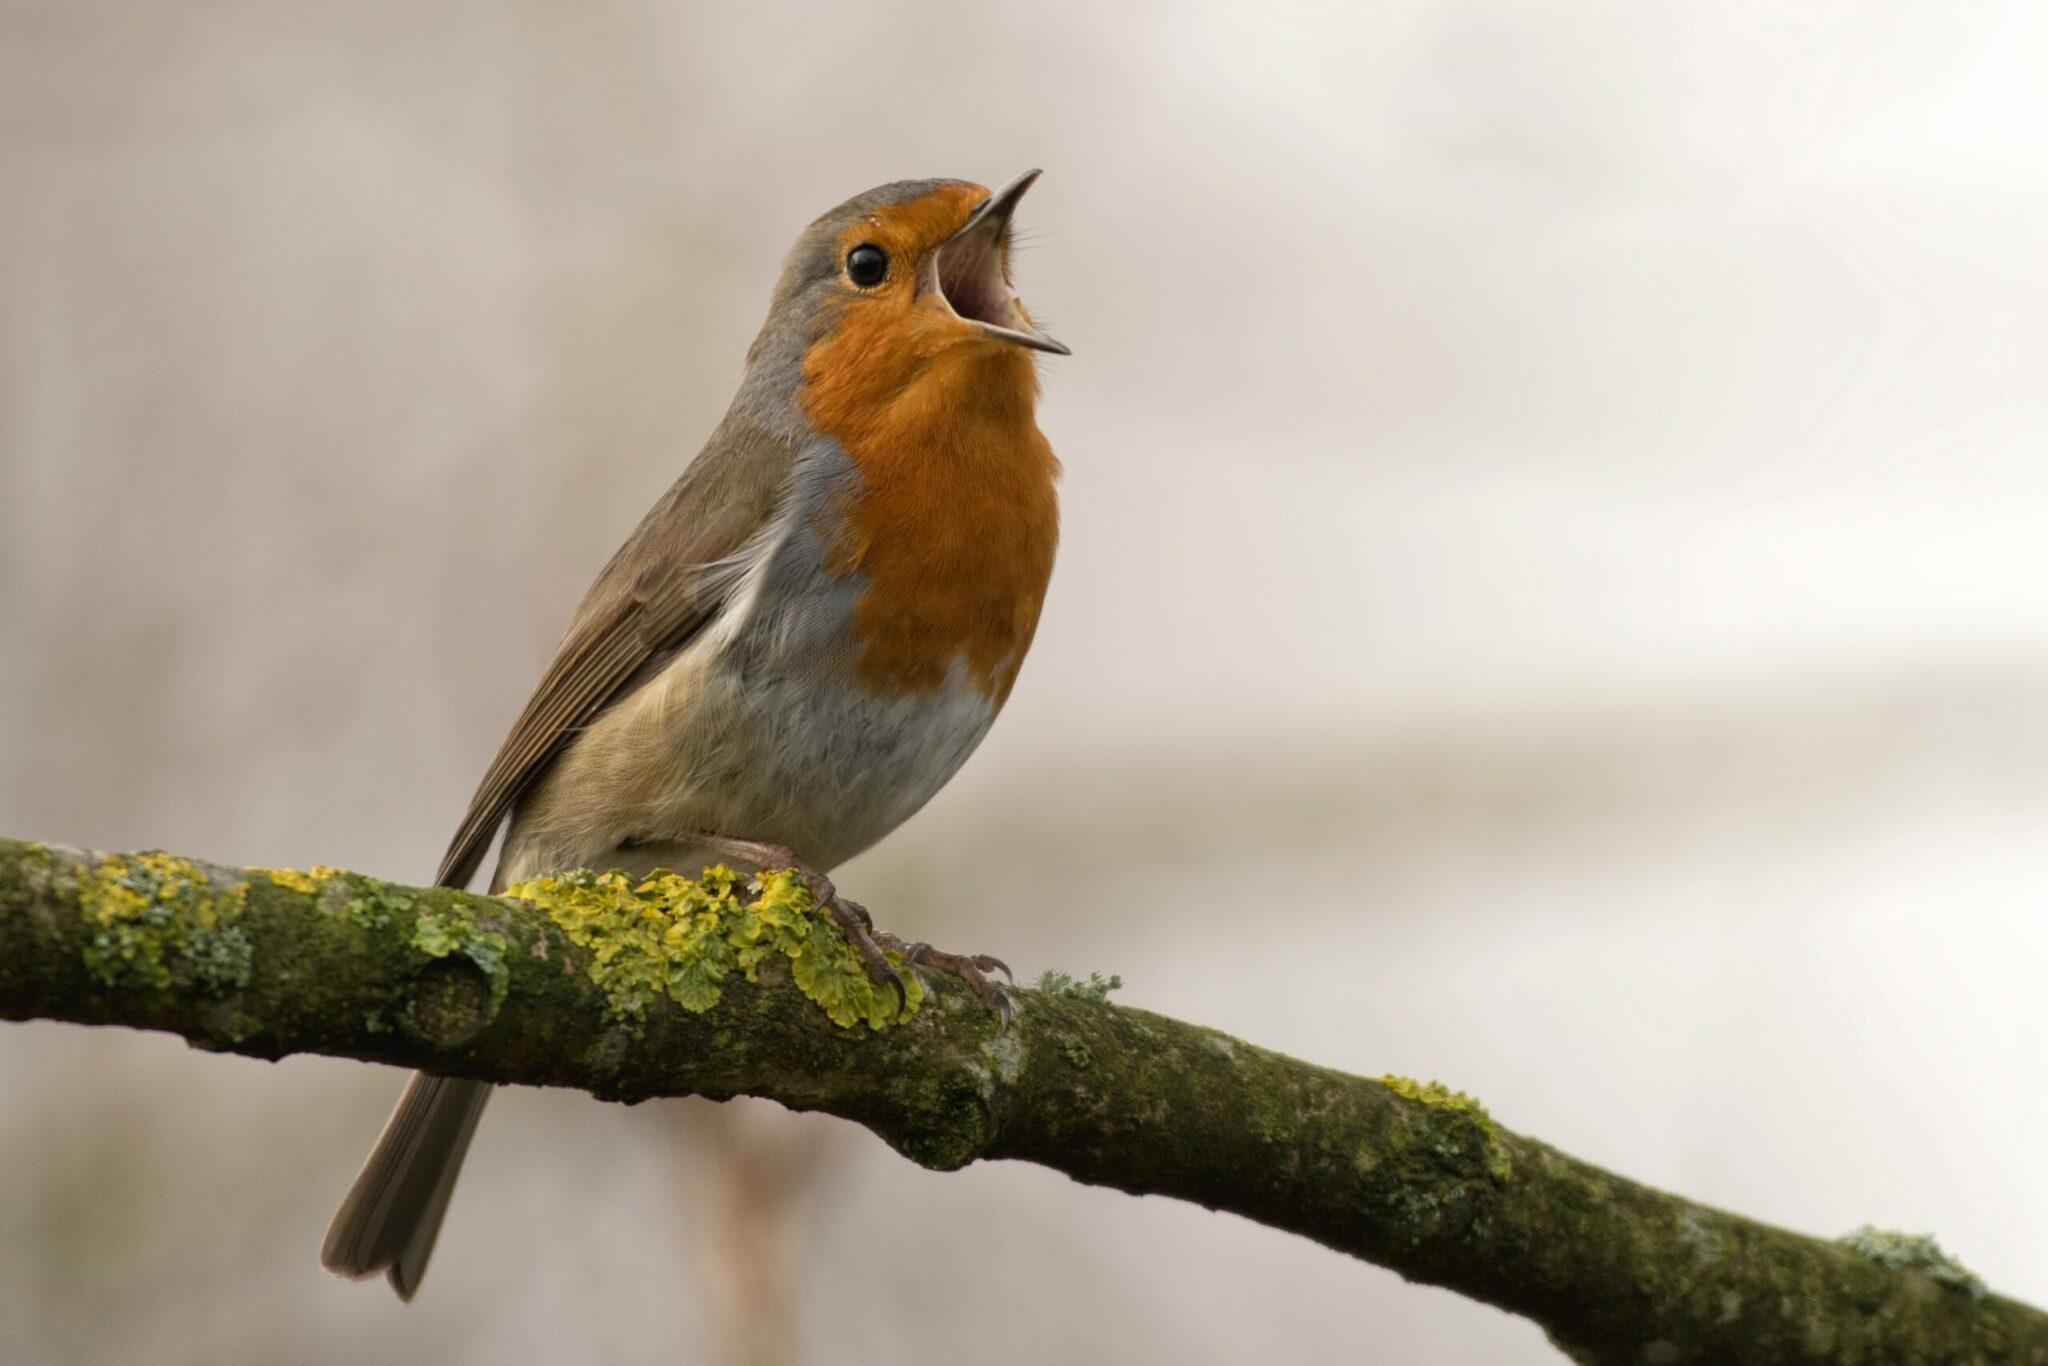 Vroege vogels via Unsplash